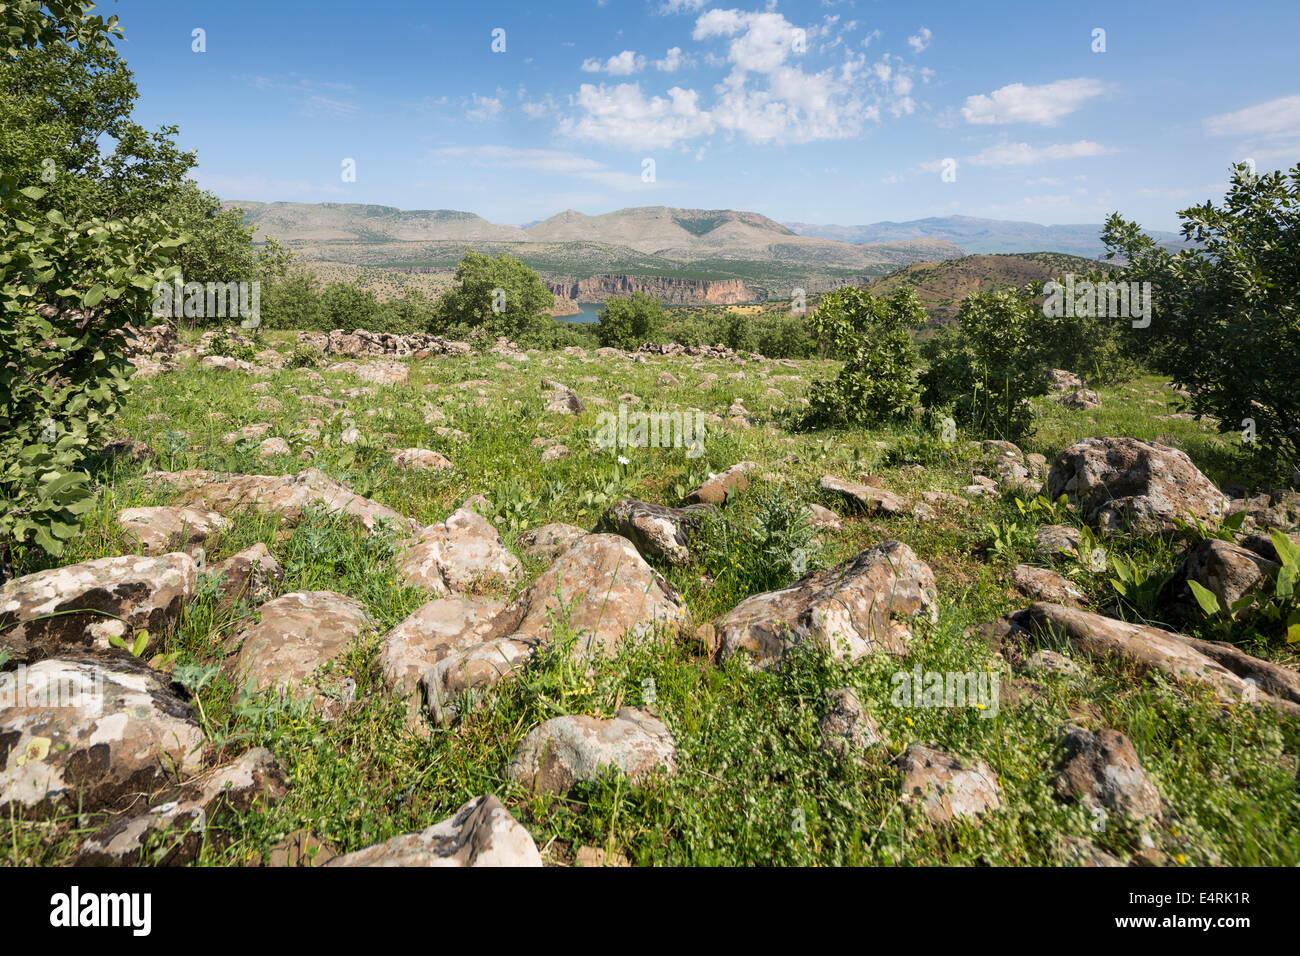 landscape between Siverek and Nemrut Dagh, Southeastern Anatolia, Turkey - Stock Image